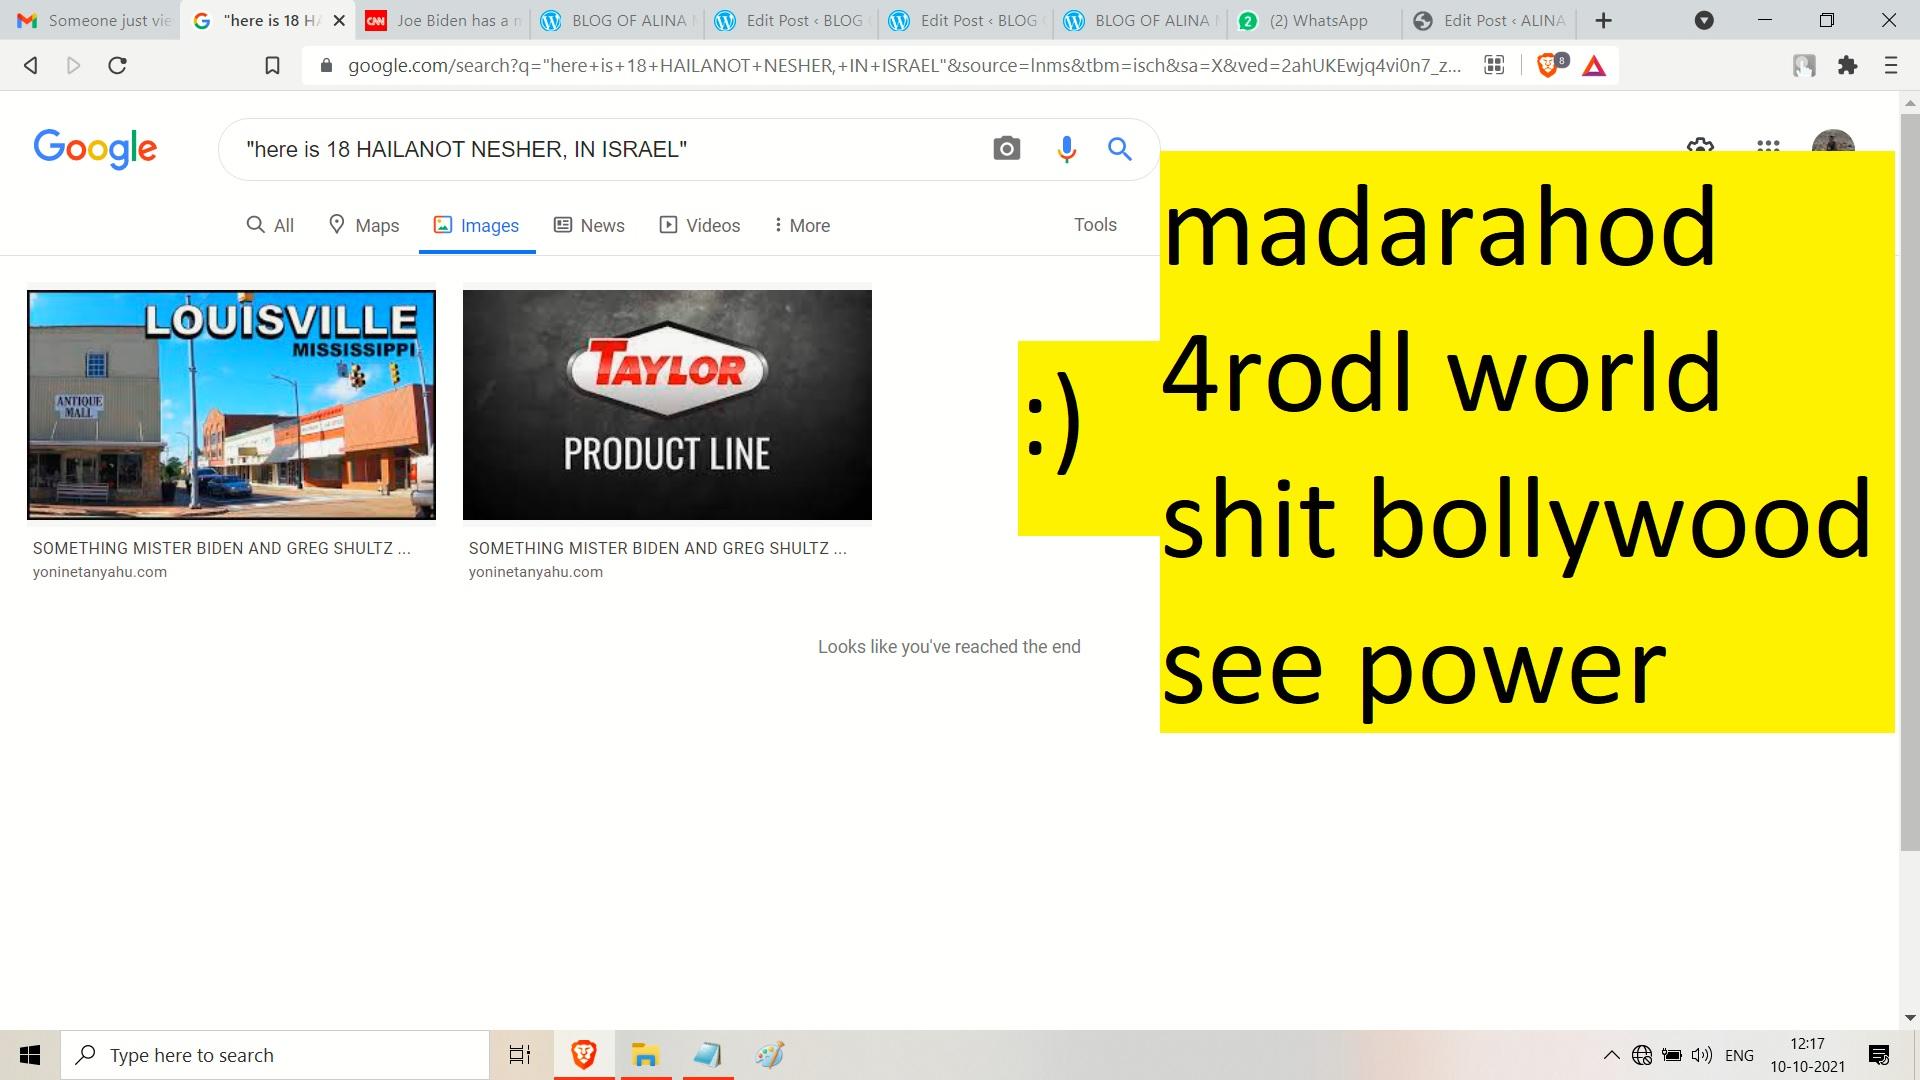 maadargod bollywod shit - and 3rd world shit - see olga and neshrr